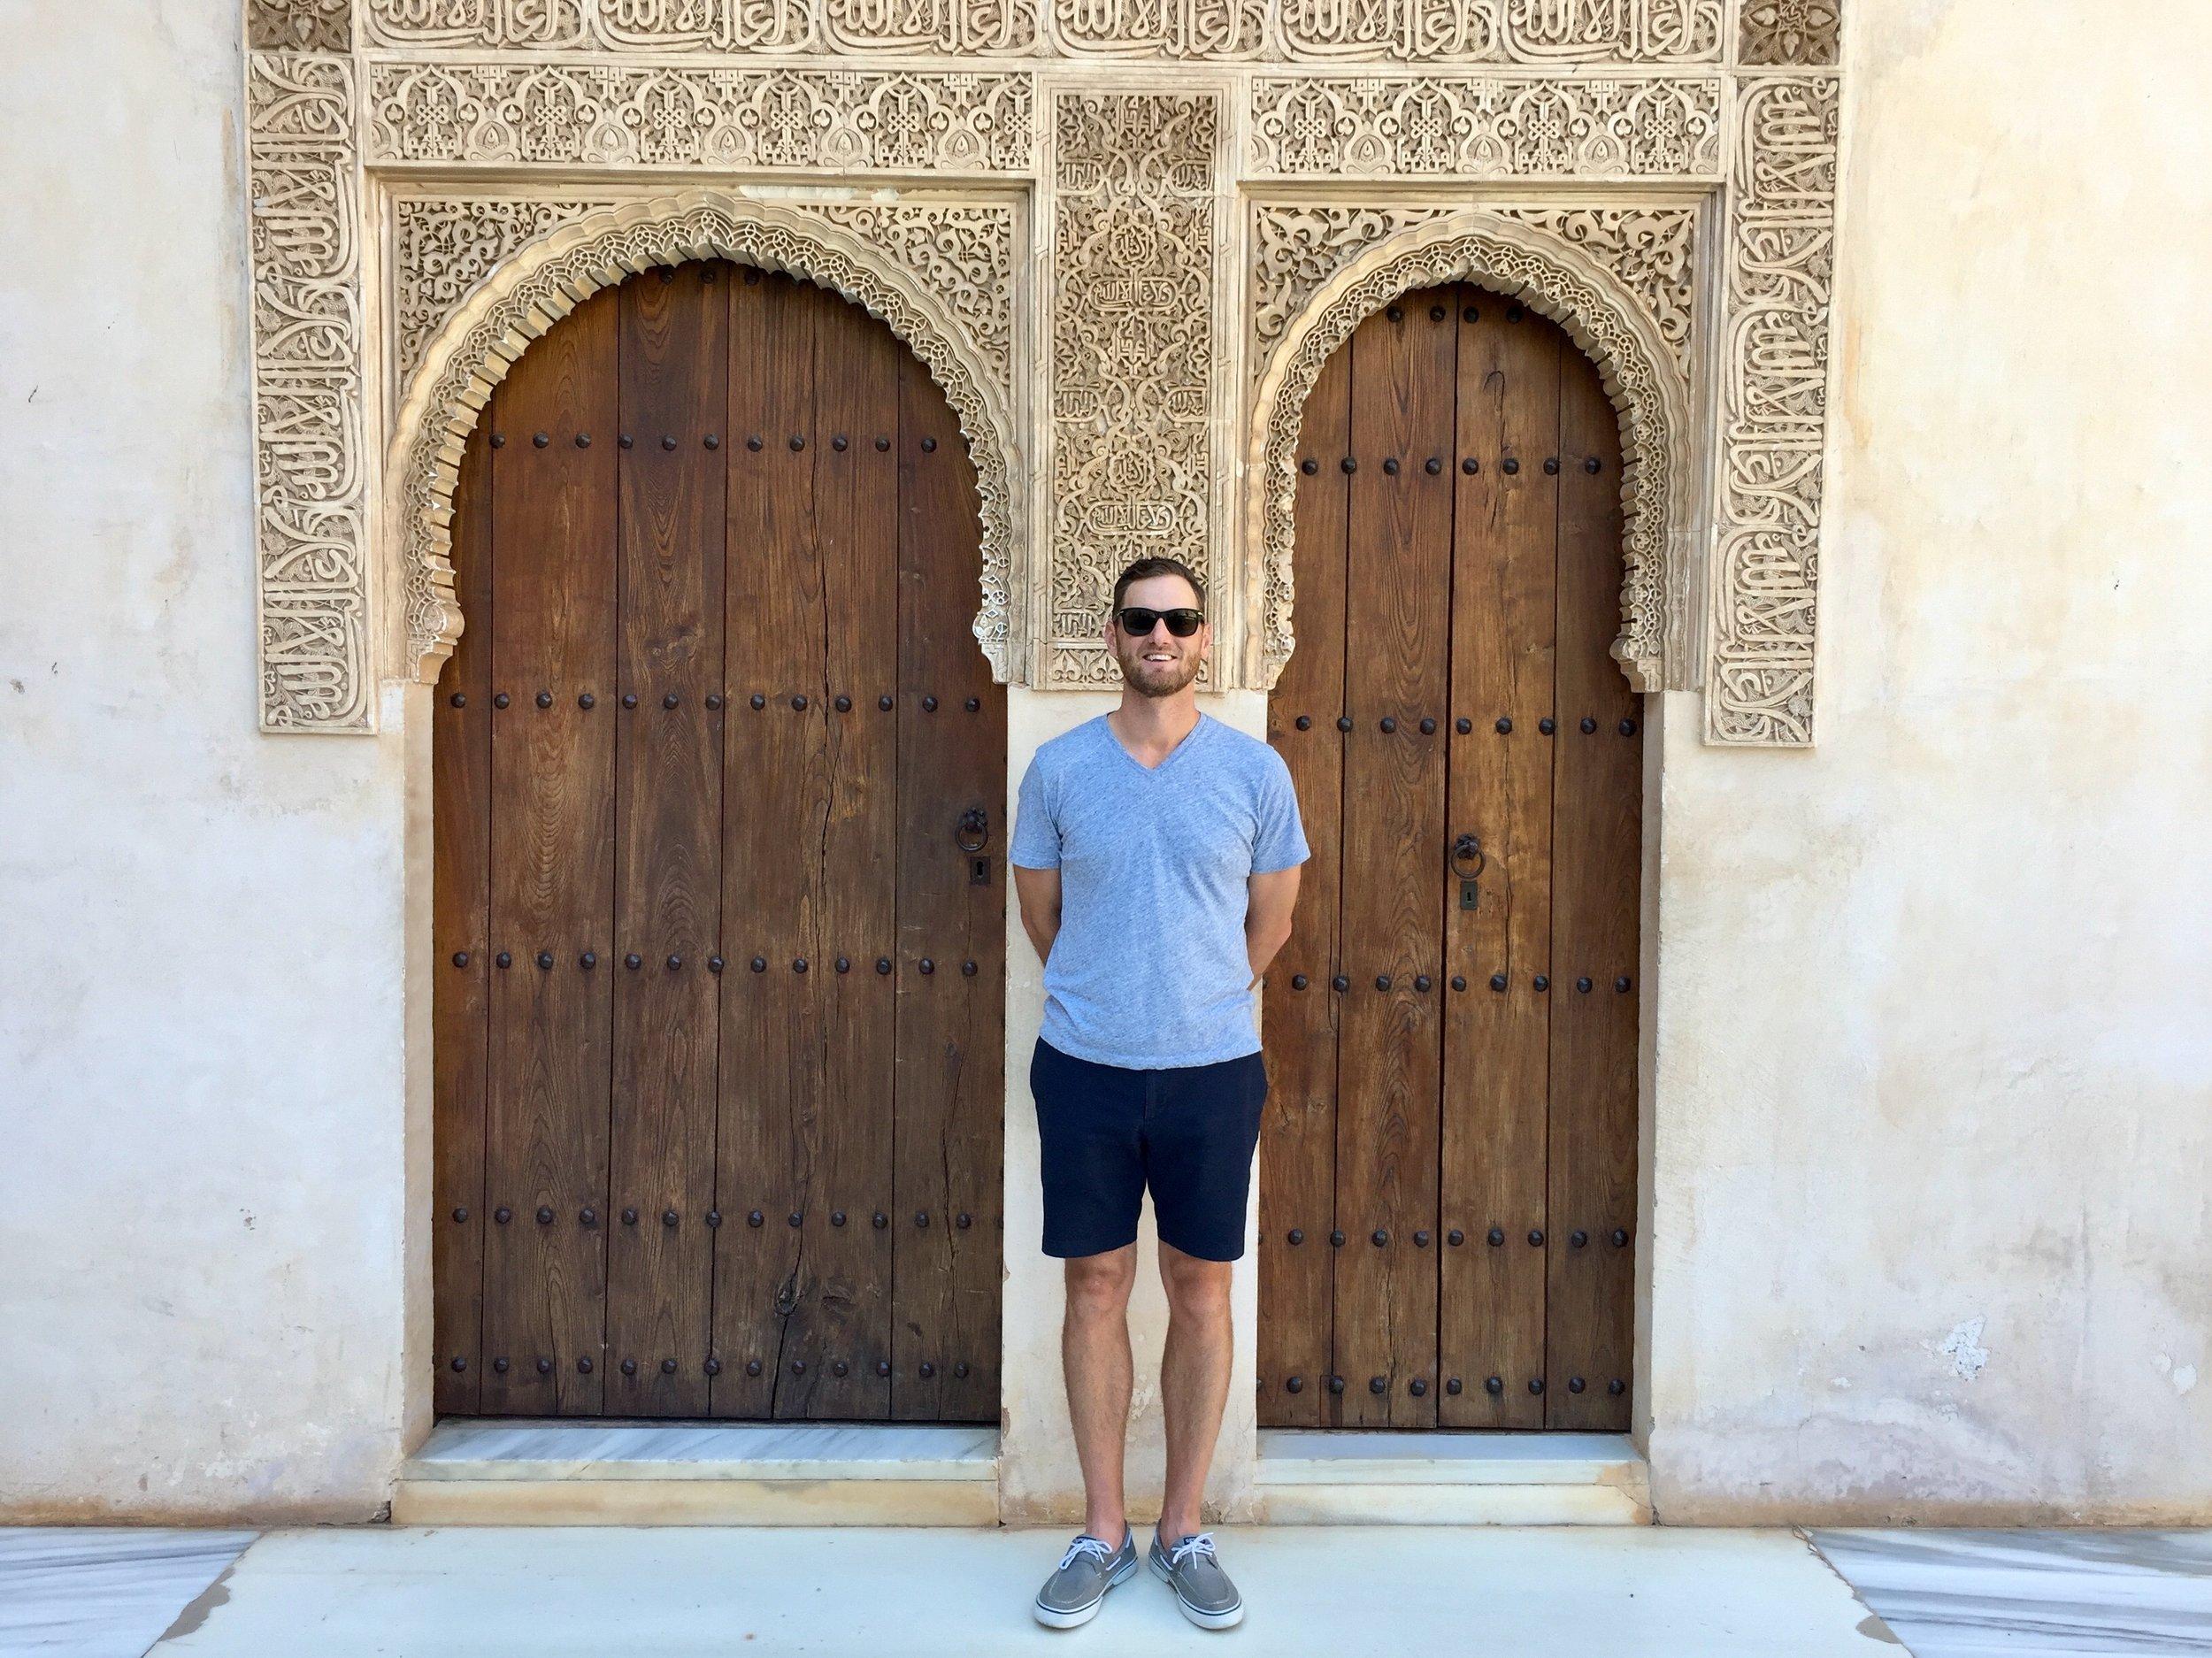 Granada Spain Alhambra Palace.jpg